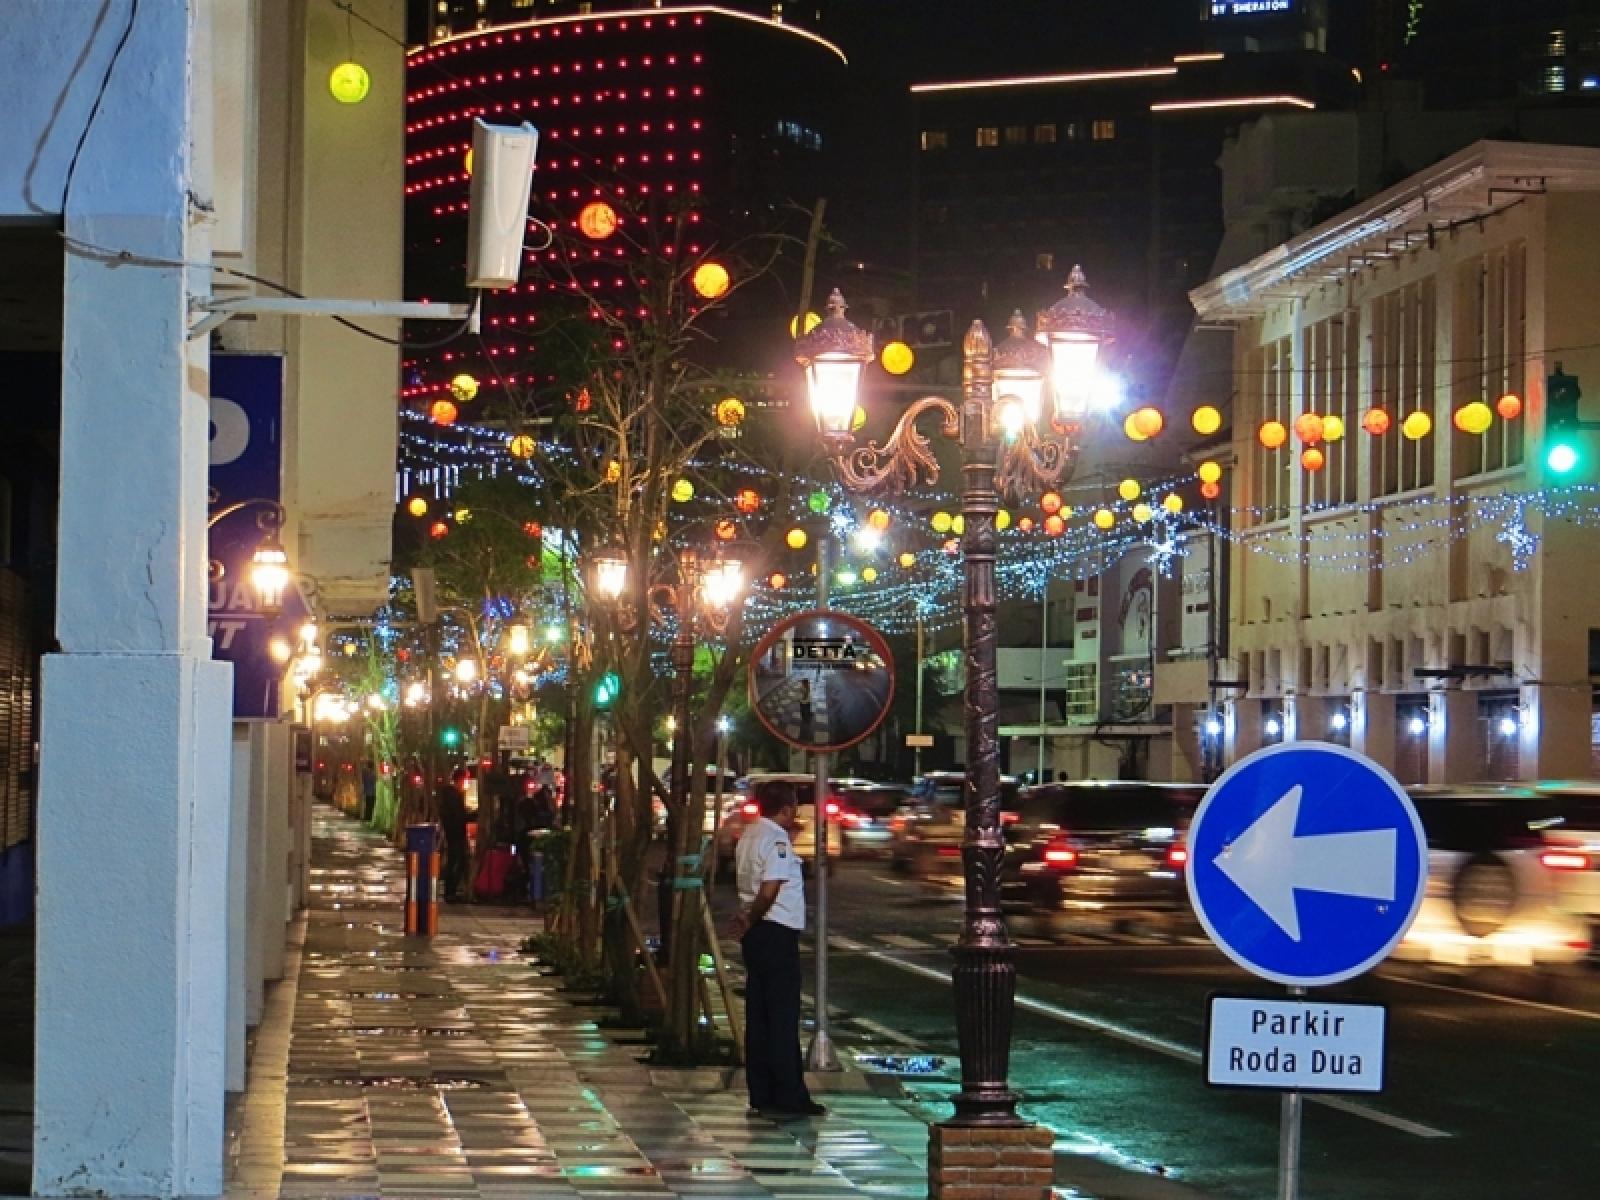 Tunjungan Jadi Daya Tarik Surabaya Malam Hari Jalan Kota